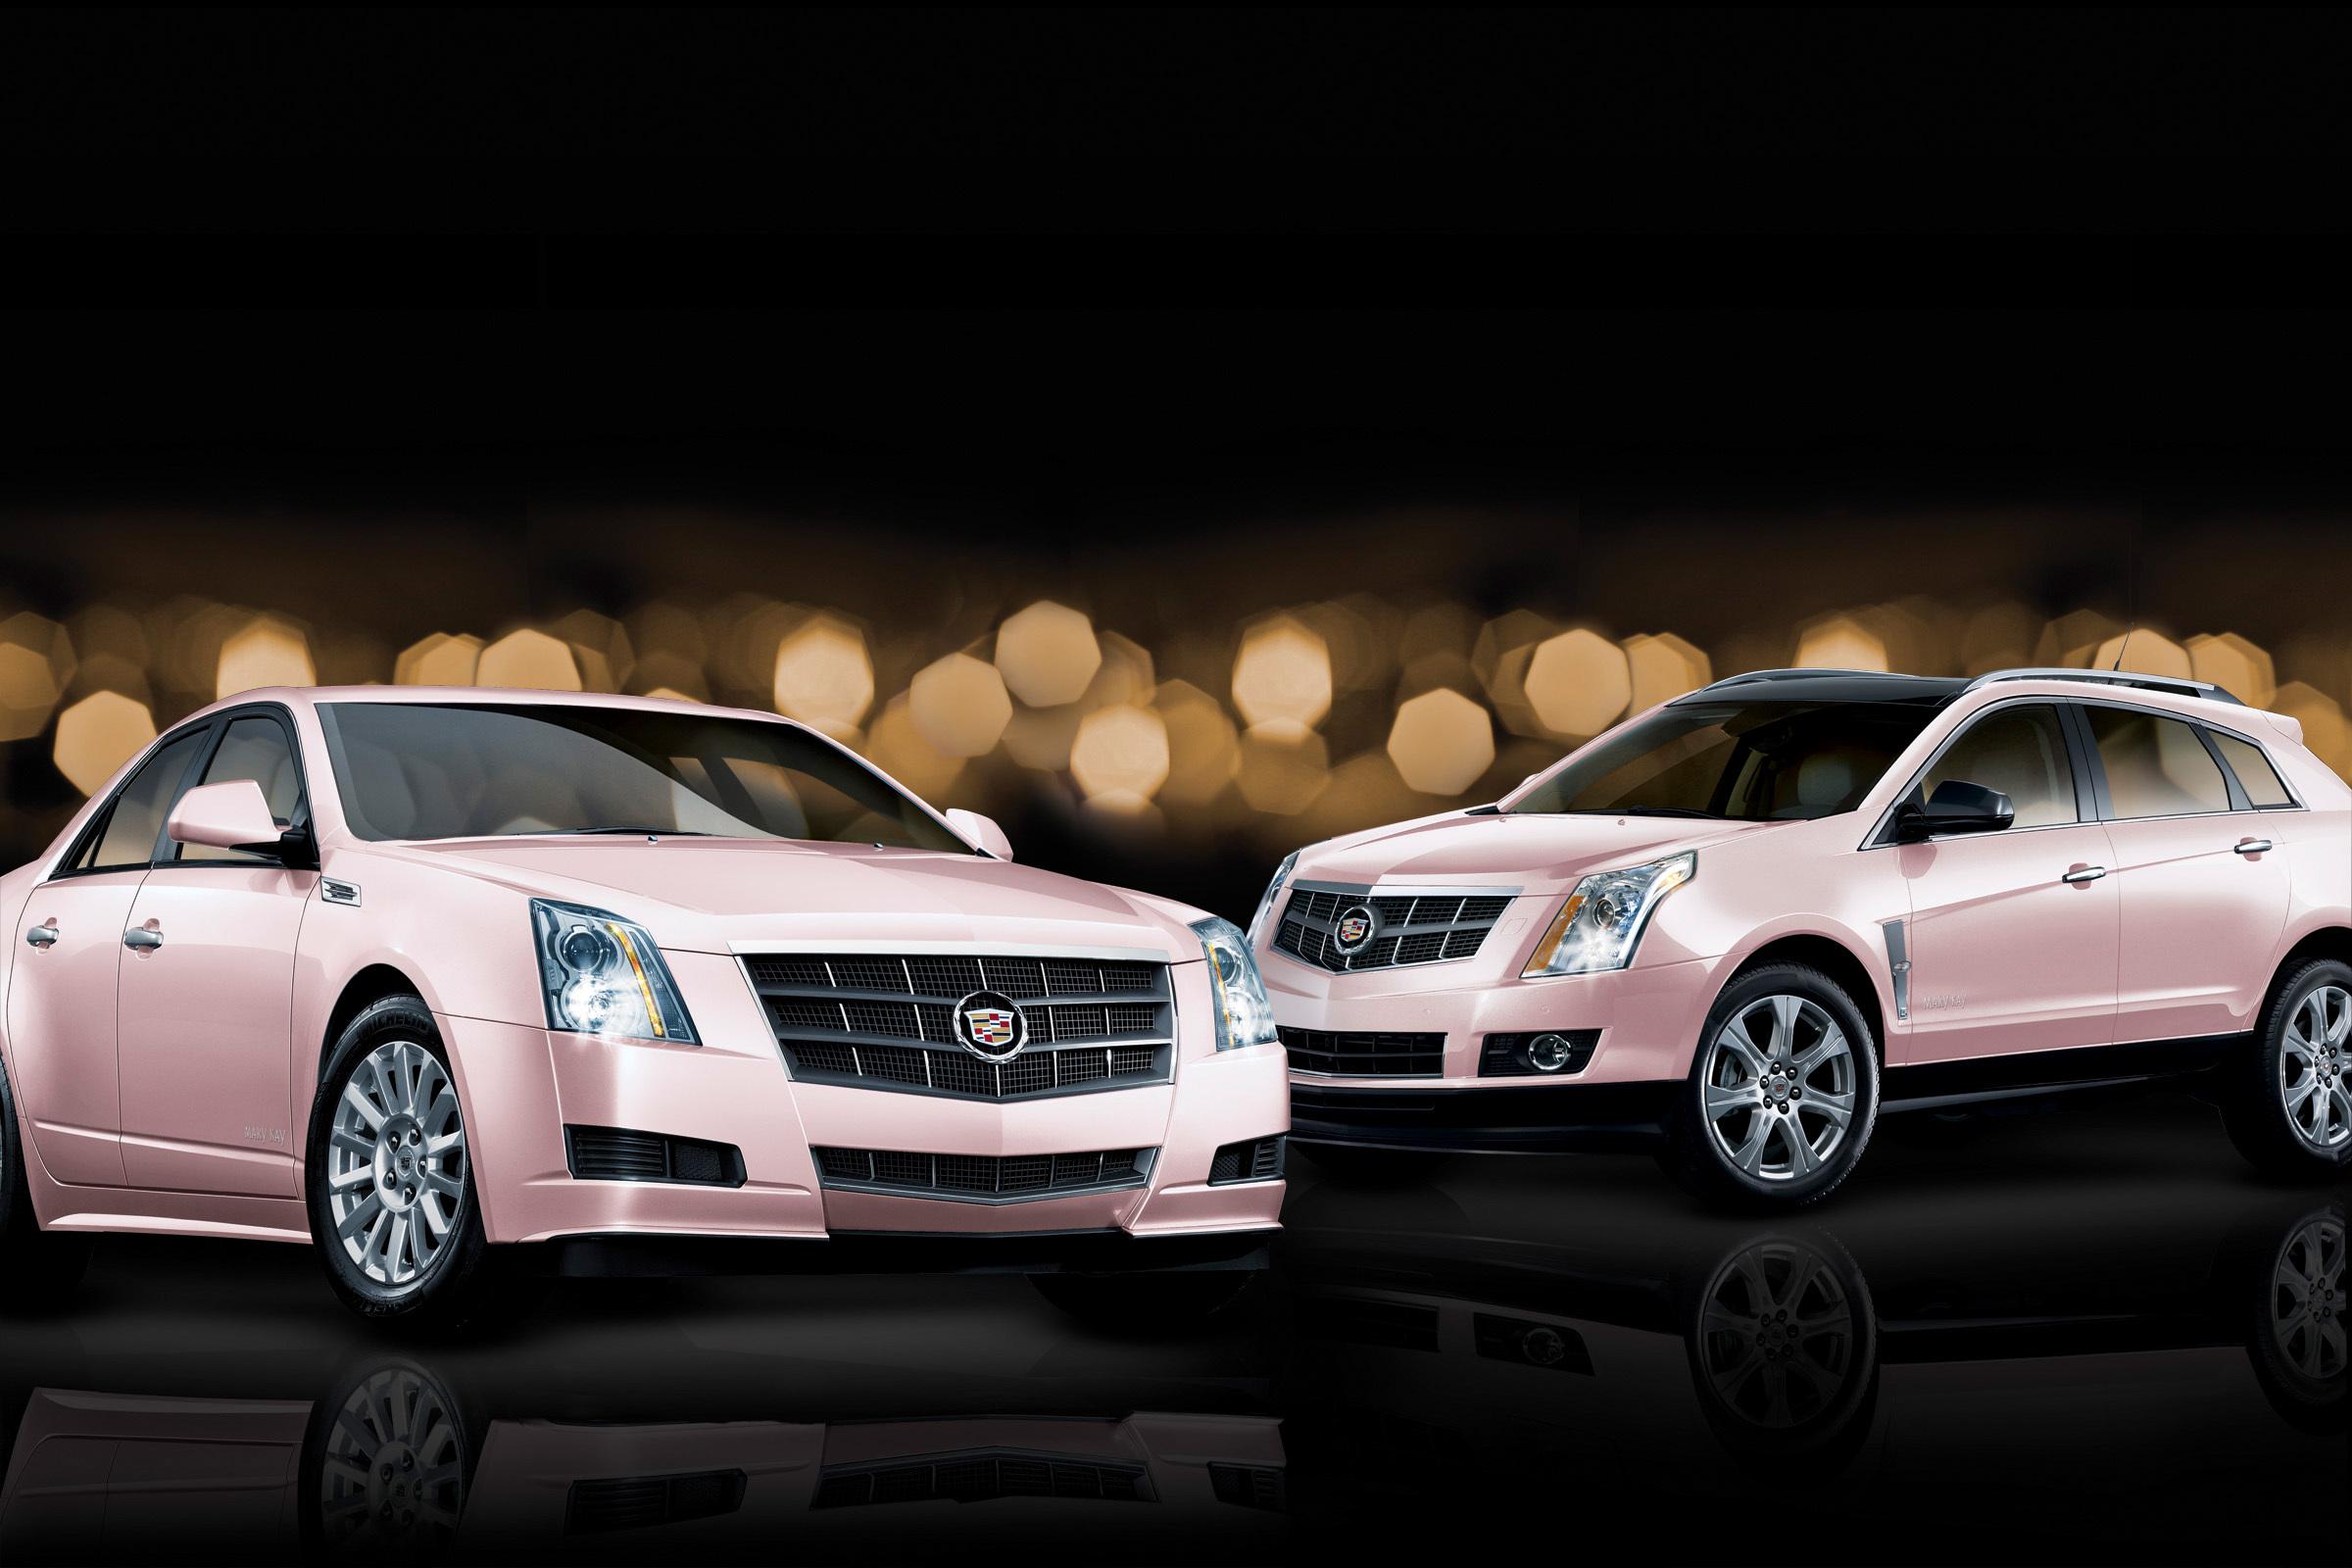 Mary Kay Celebrates Birthday of Iconic Pink Cadillac